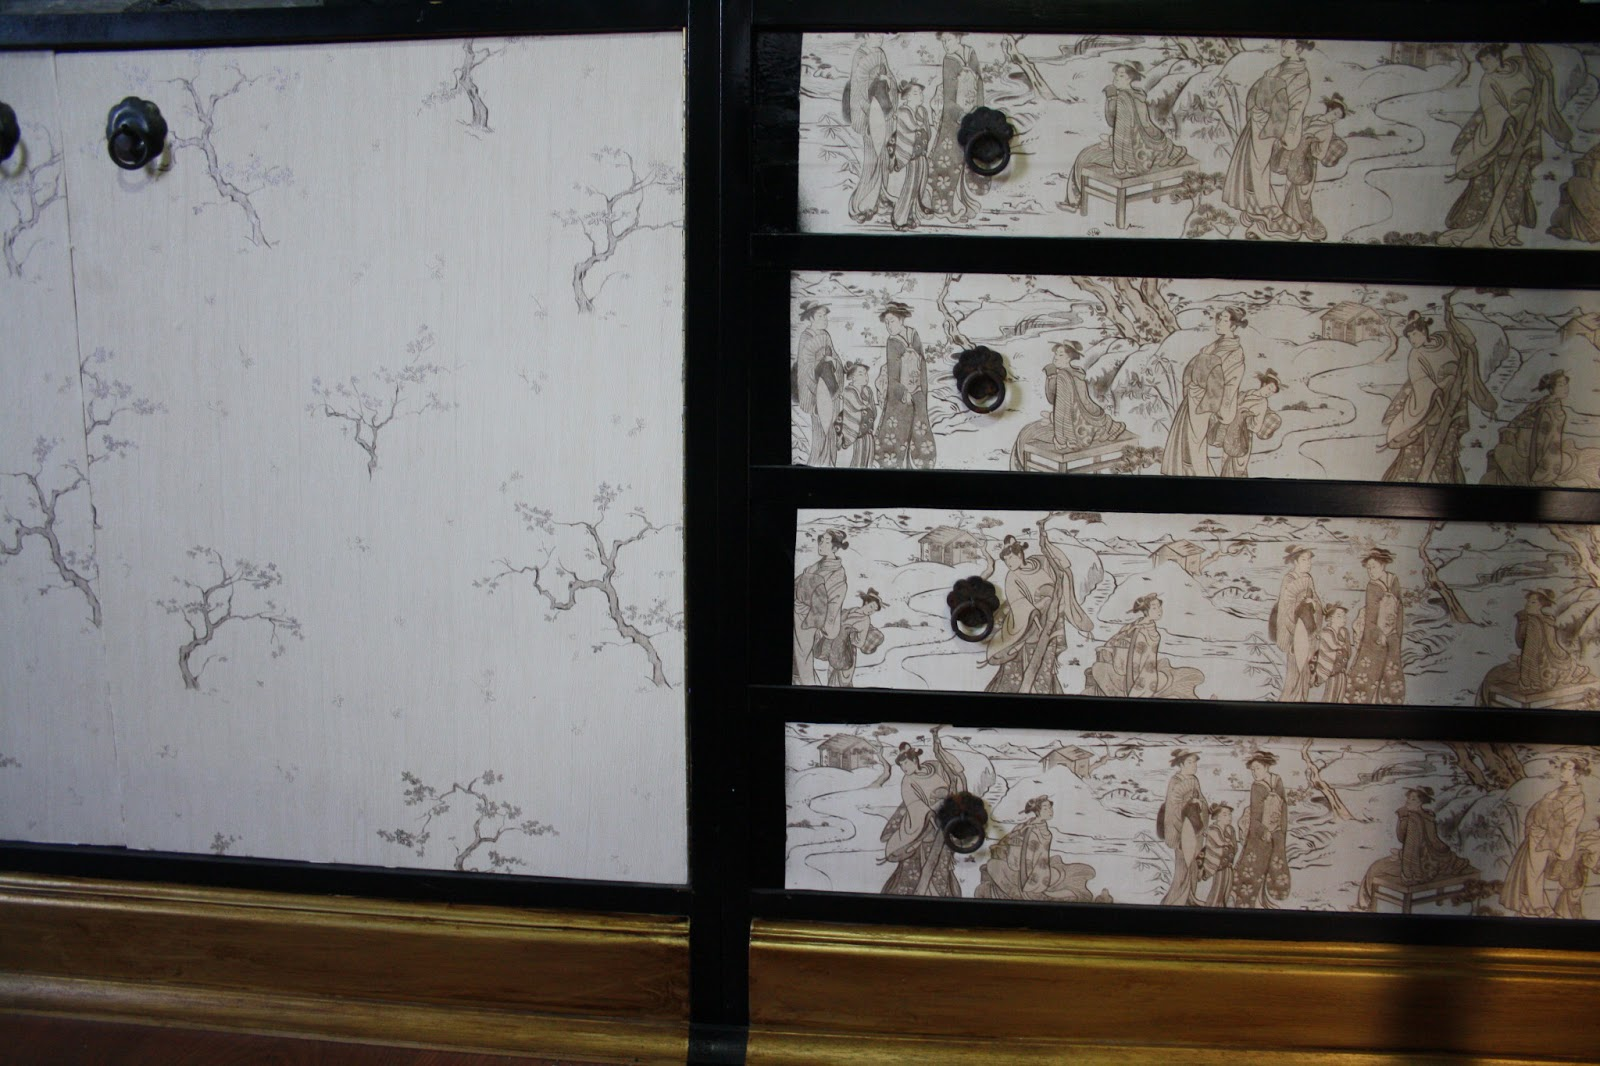 Boutique papel pintado enero 2013 - Empapelar muebles ...